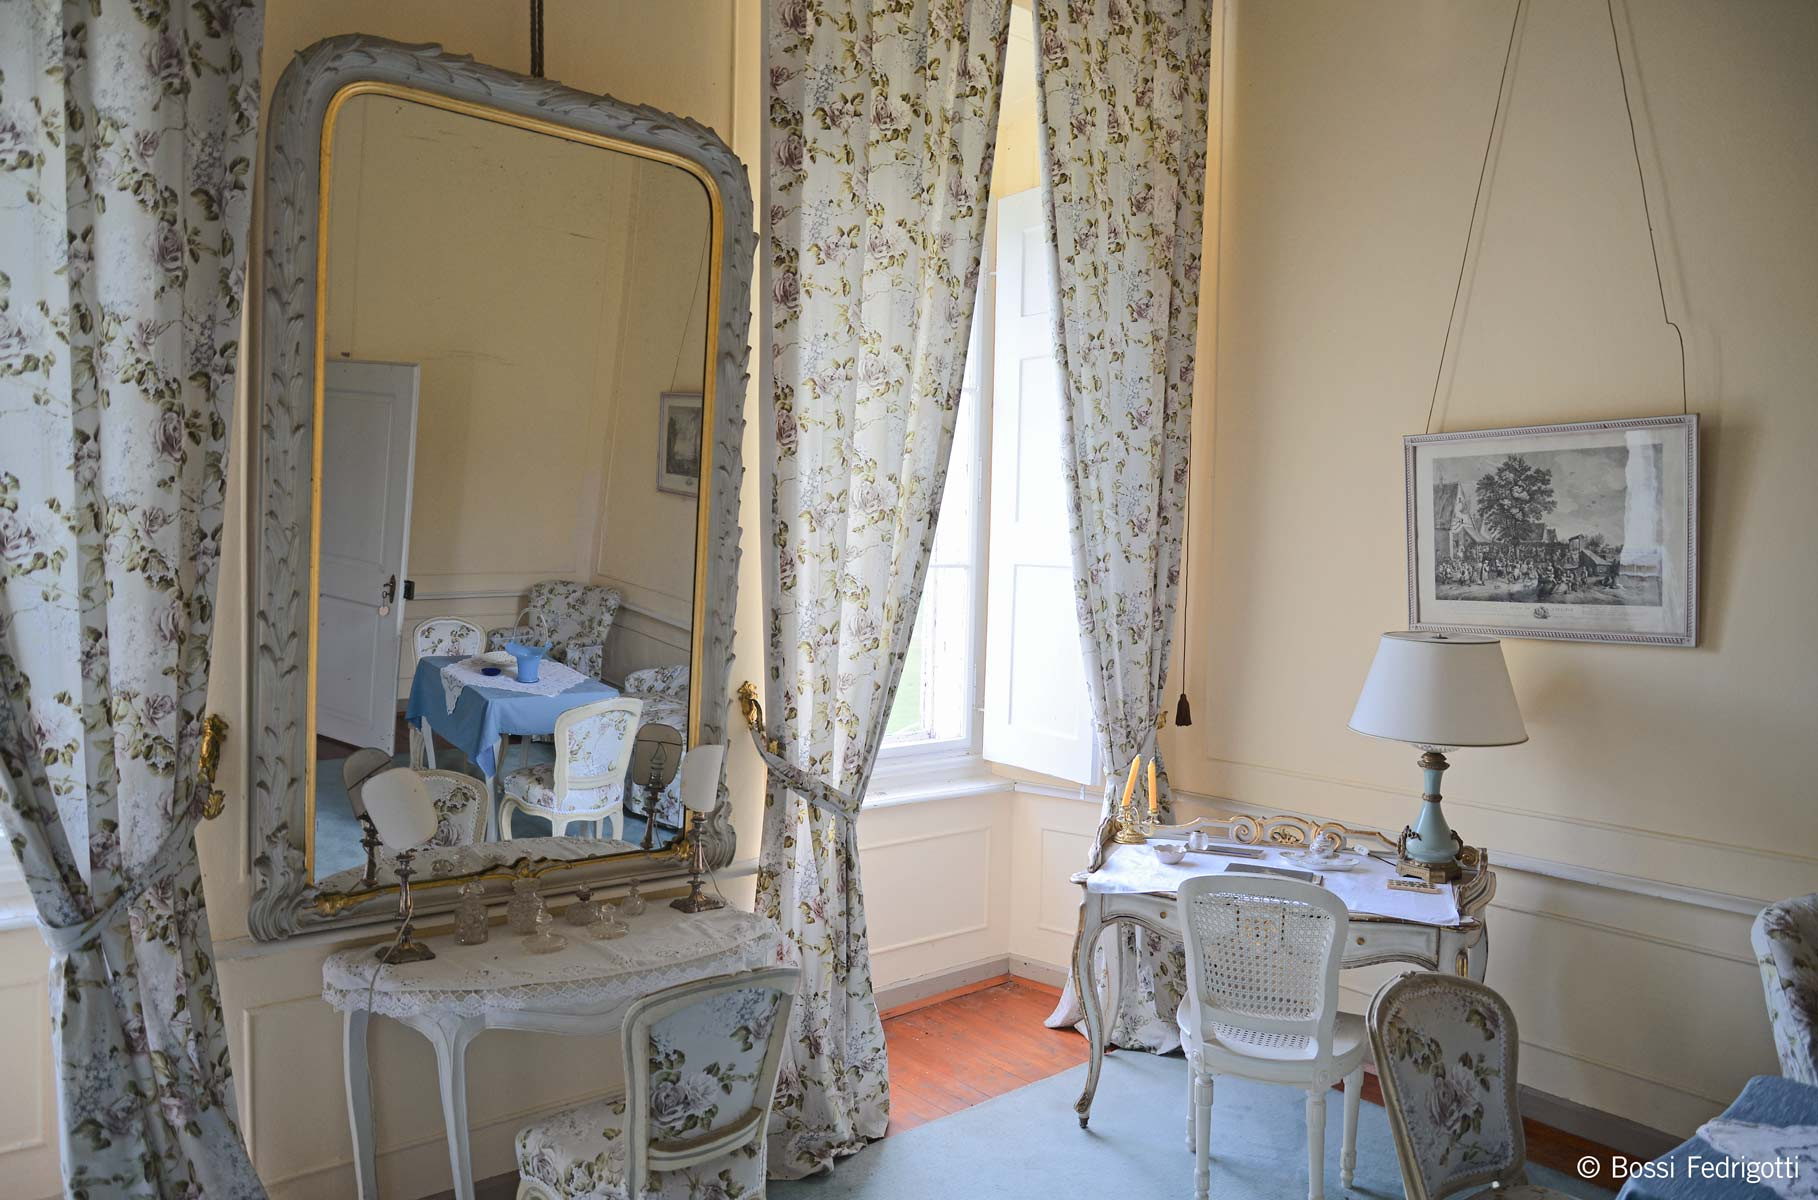 Schloss-Weinern_137_Bossi-Fedrigotti.jpg